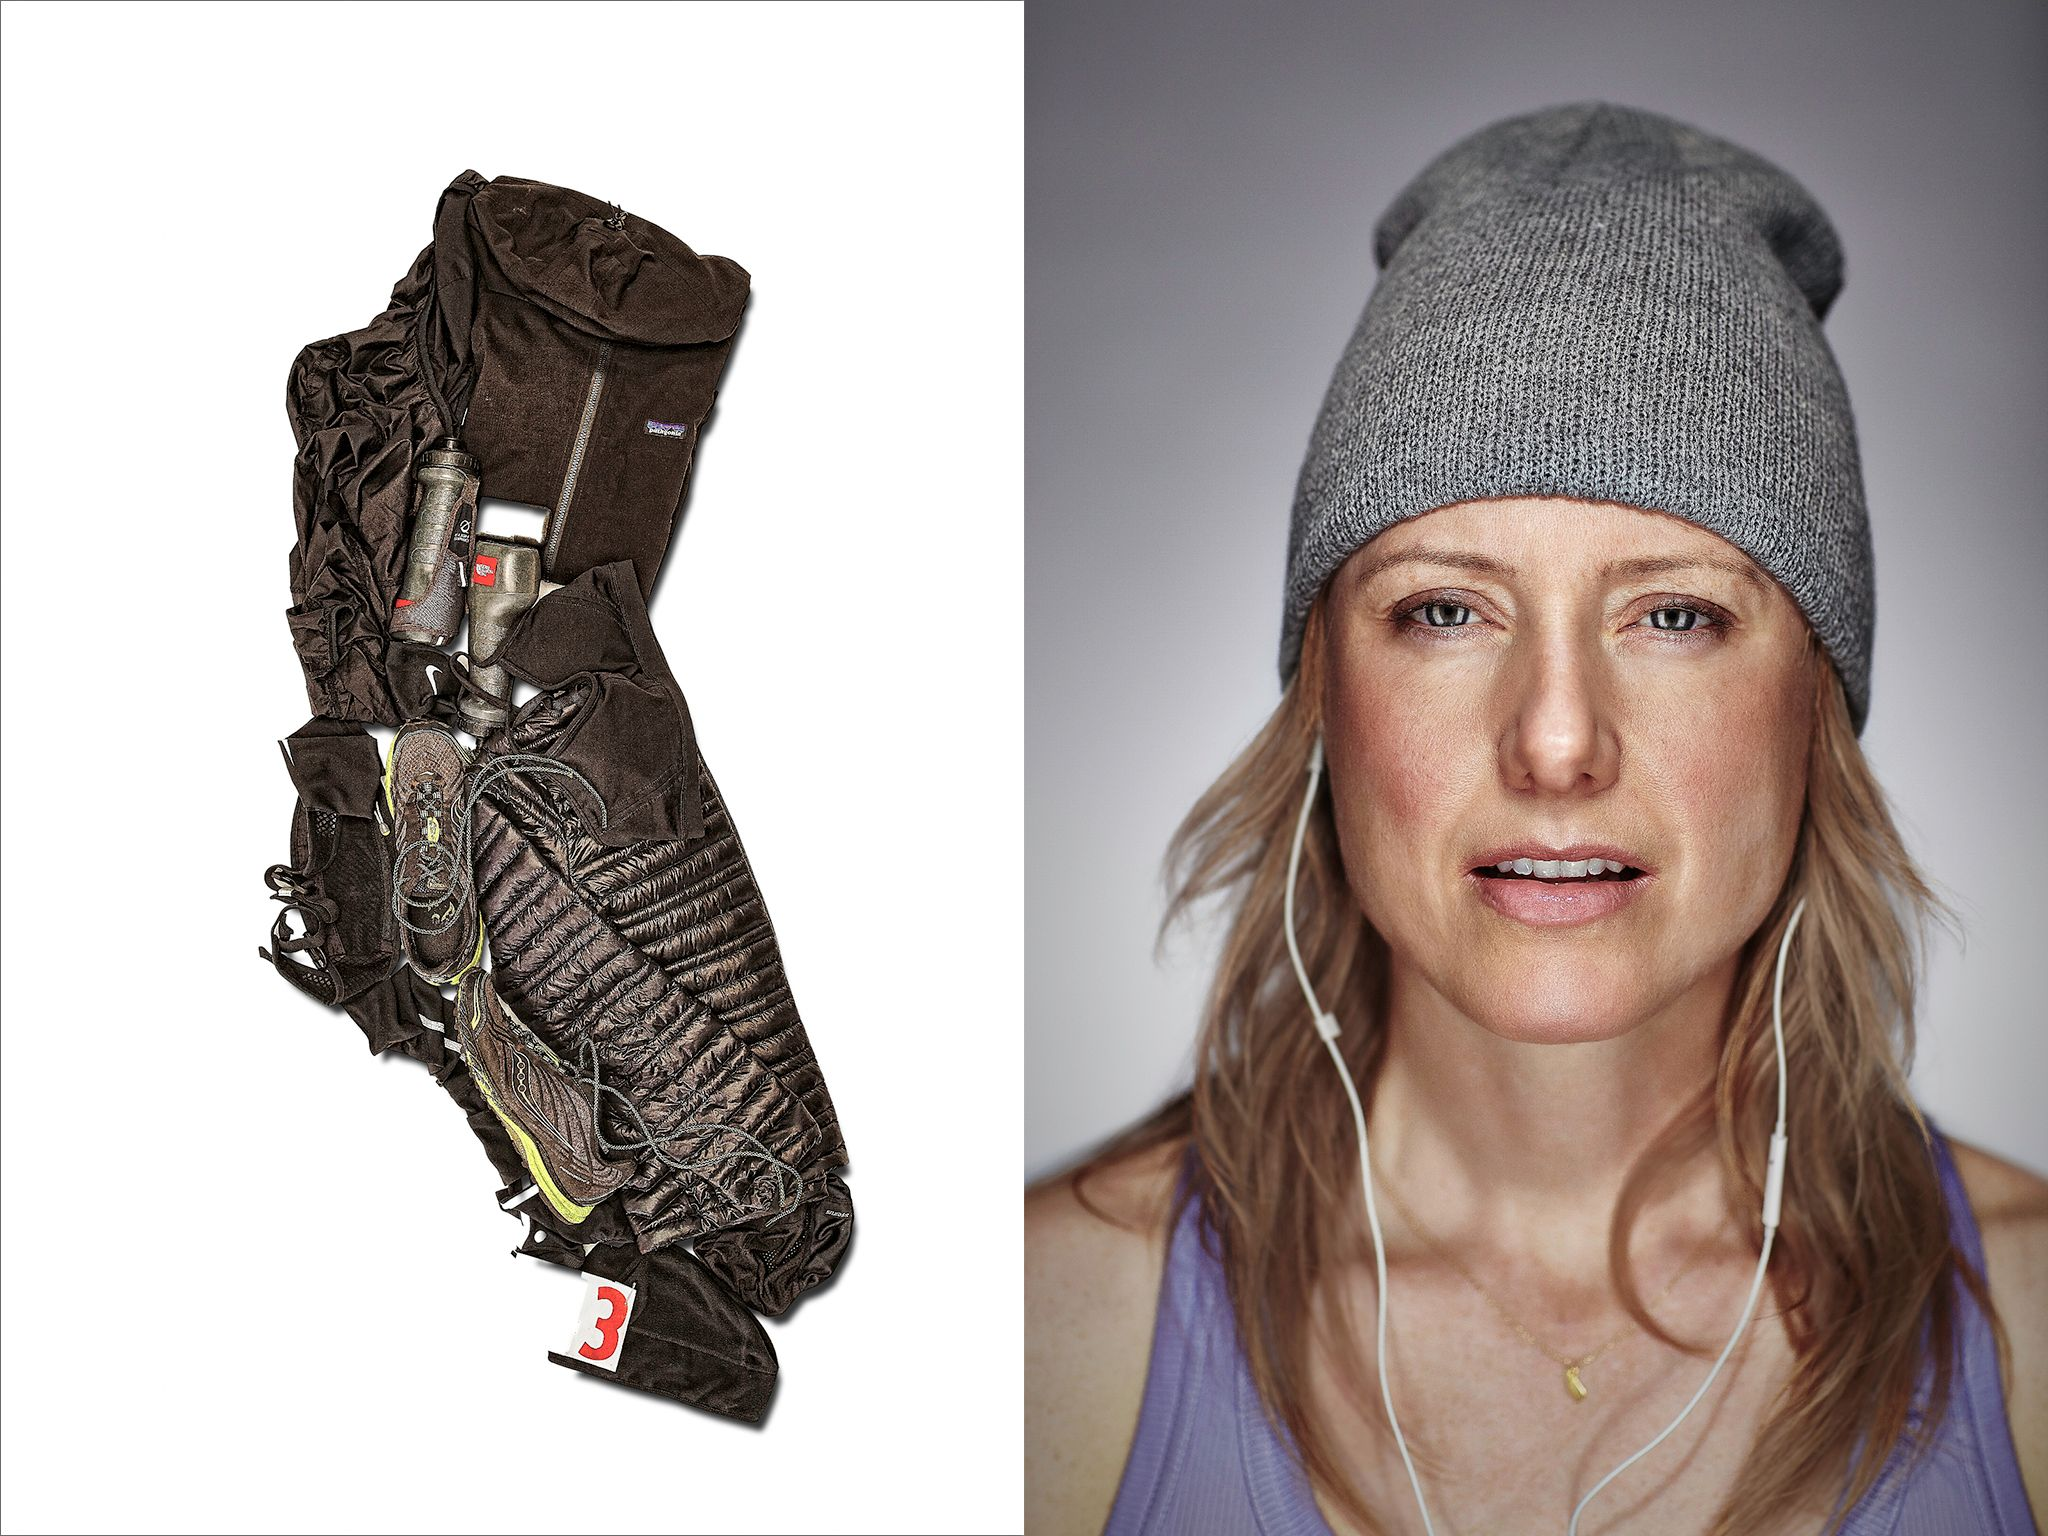 Jennifer Pattee - Fitness Maven & Entrepreneur | Vance Jacobs Photography